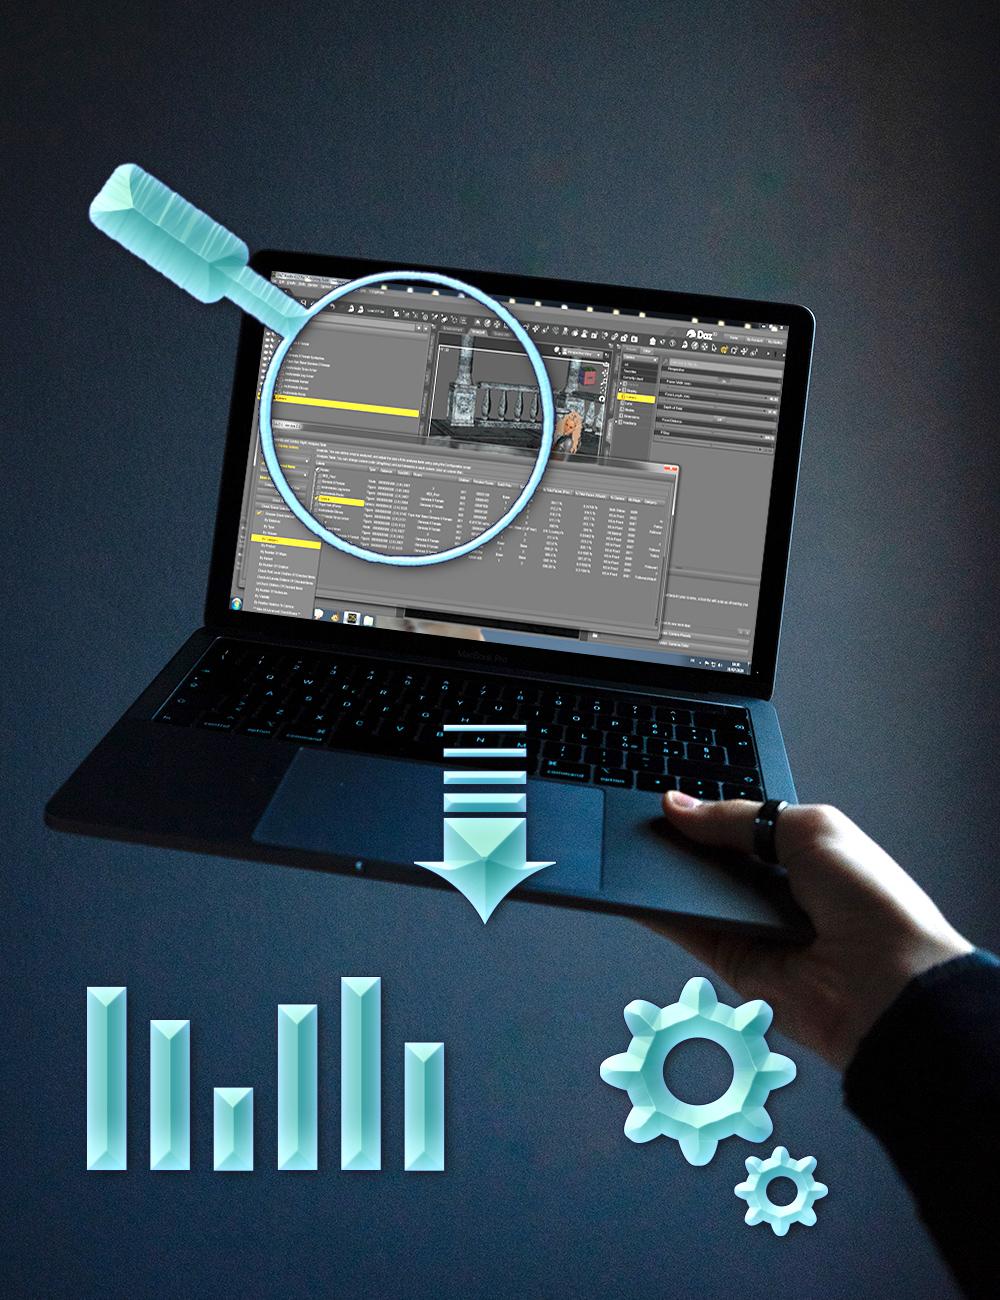 Scene Analyzer Organizer Simplifier by: V3Digitimes, 3D Models by Daz 3D